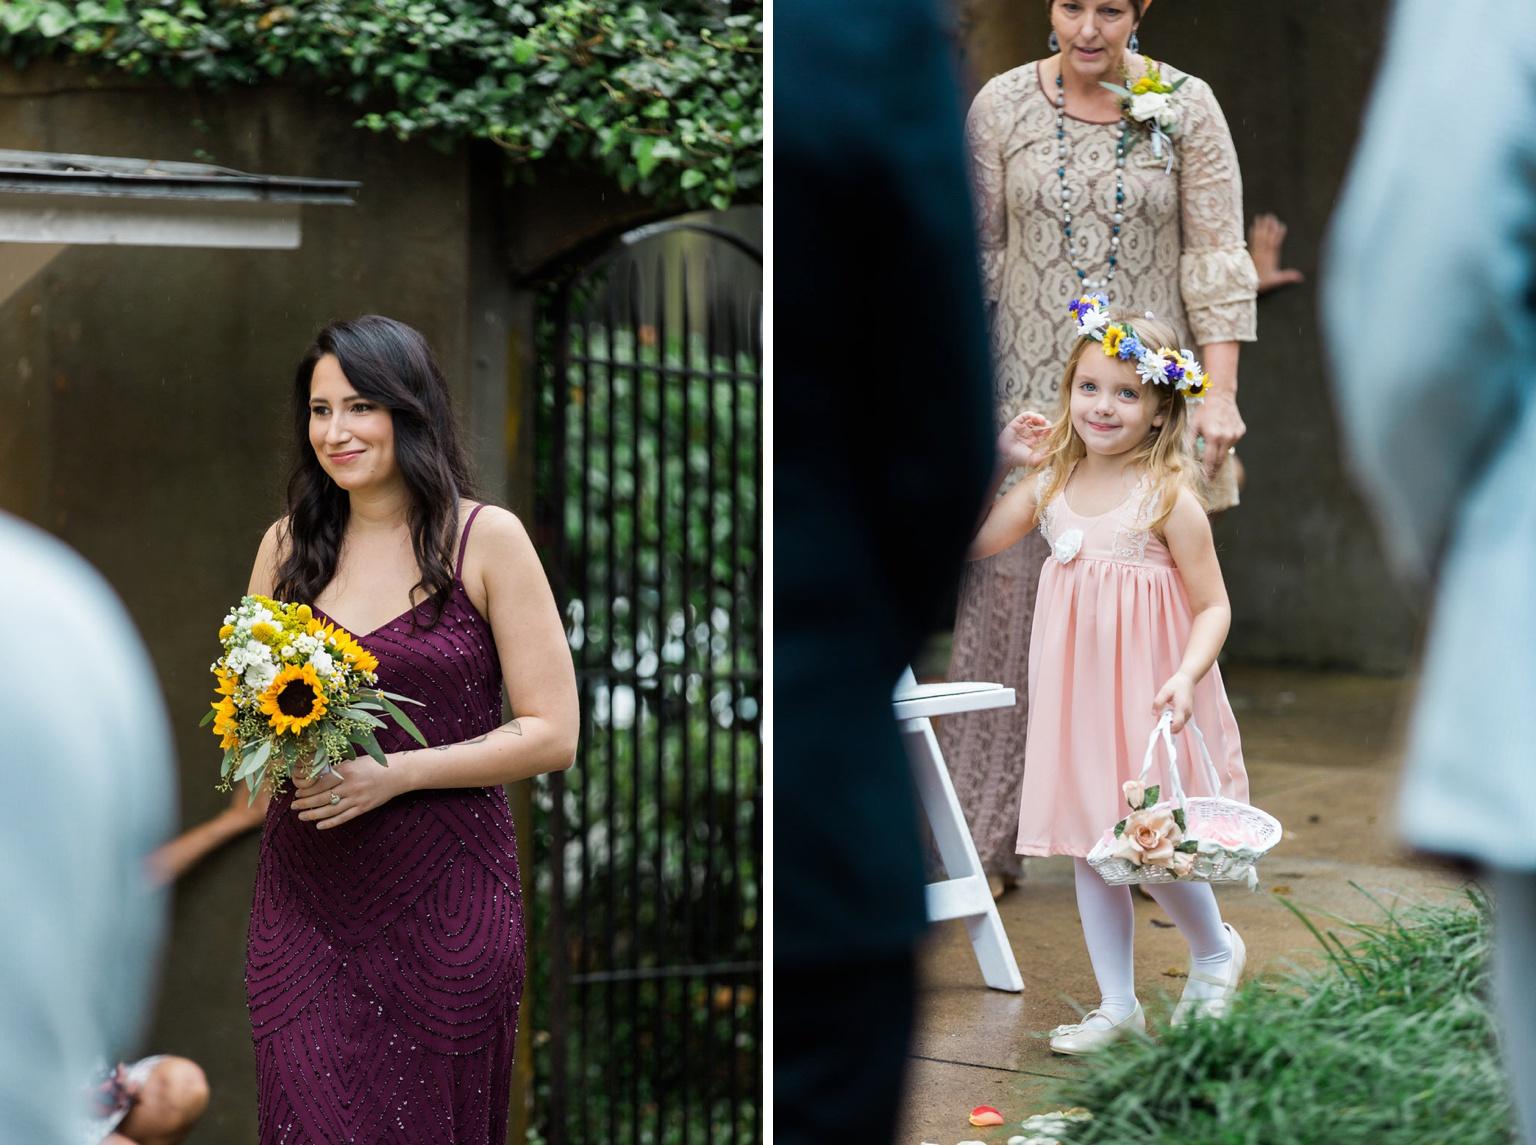 Apt_B_Photo_Savannah_Wedding_Photographer_Flower_Crown023.JPG